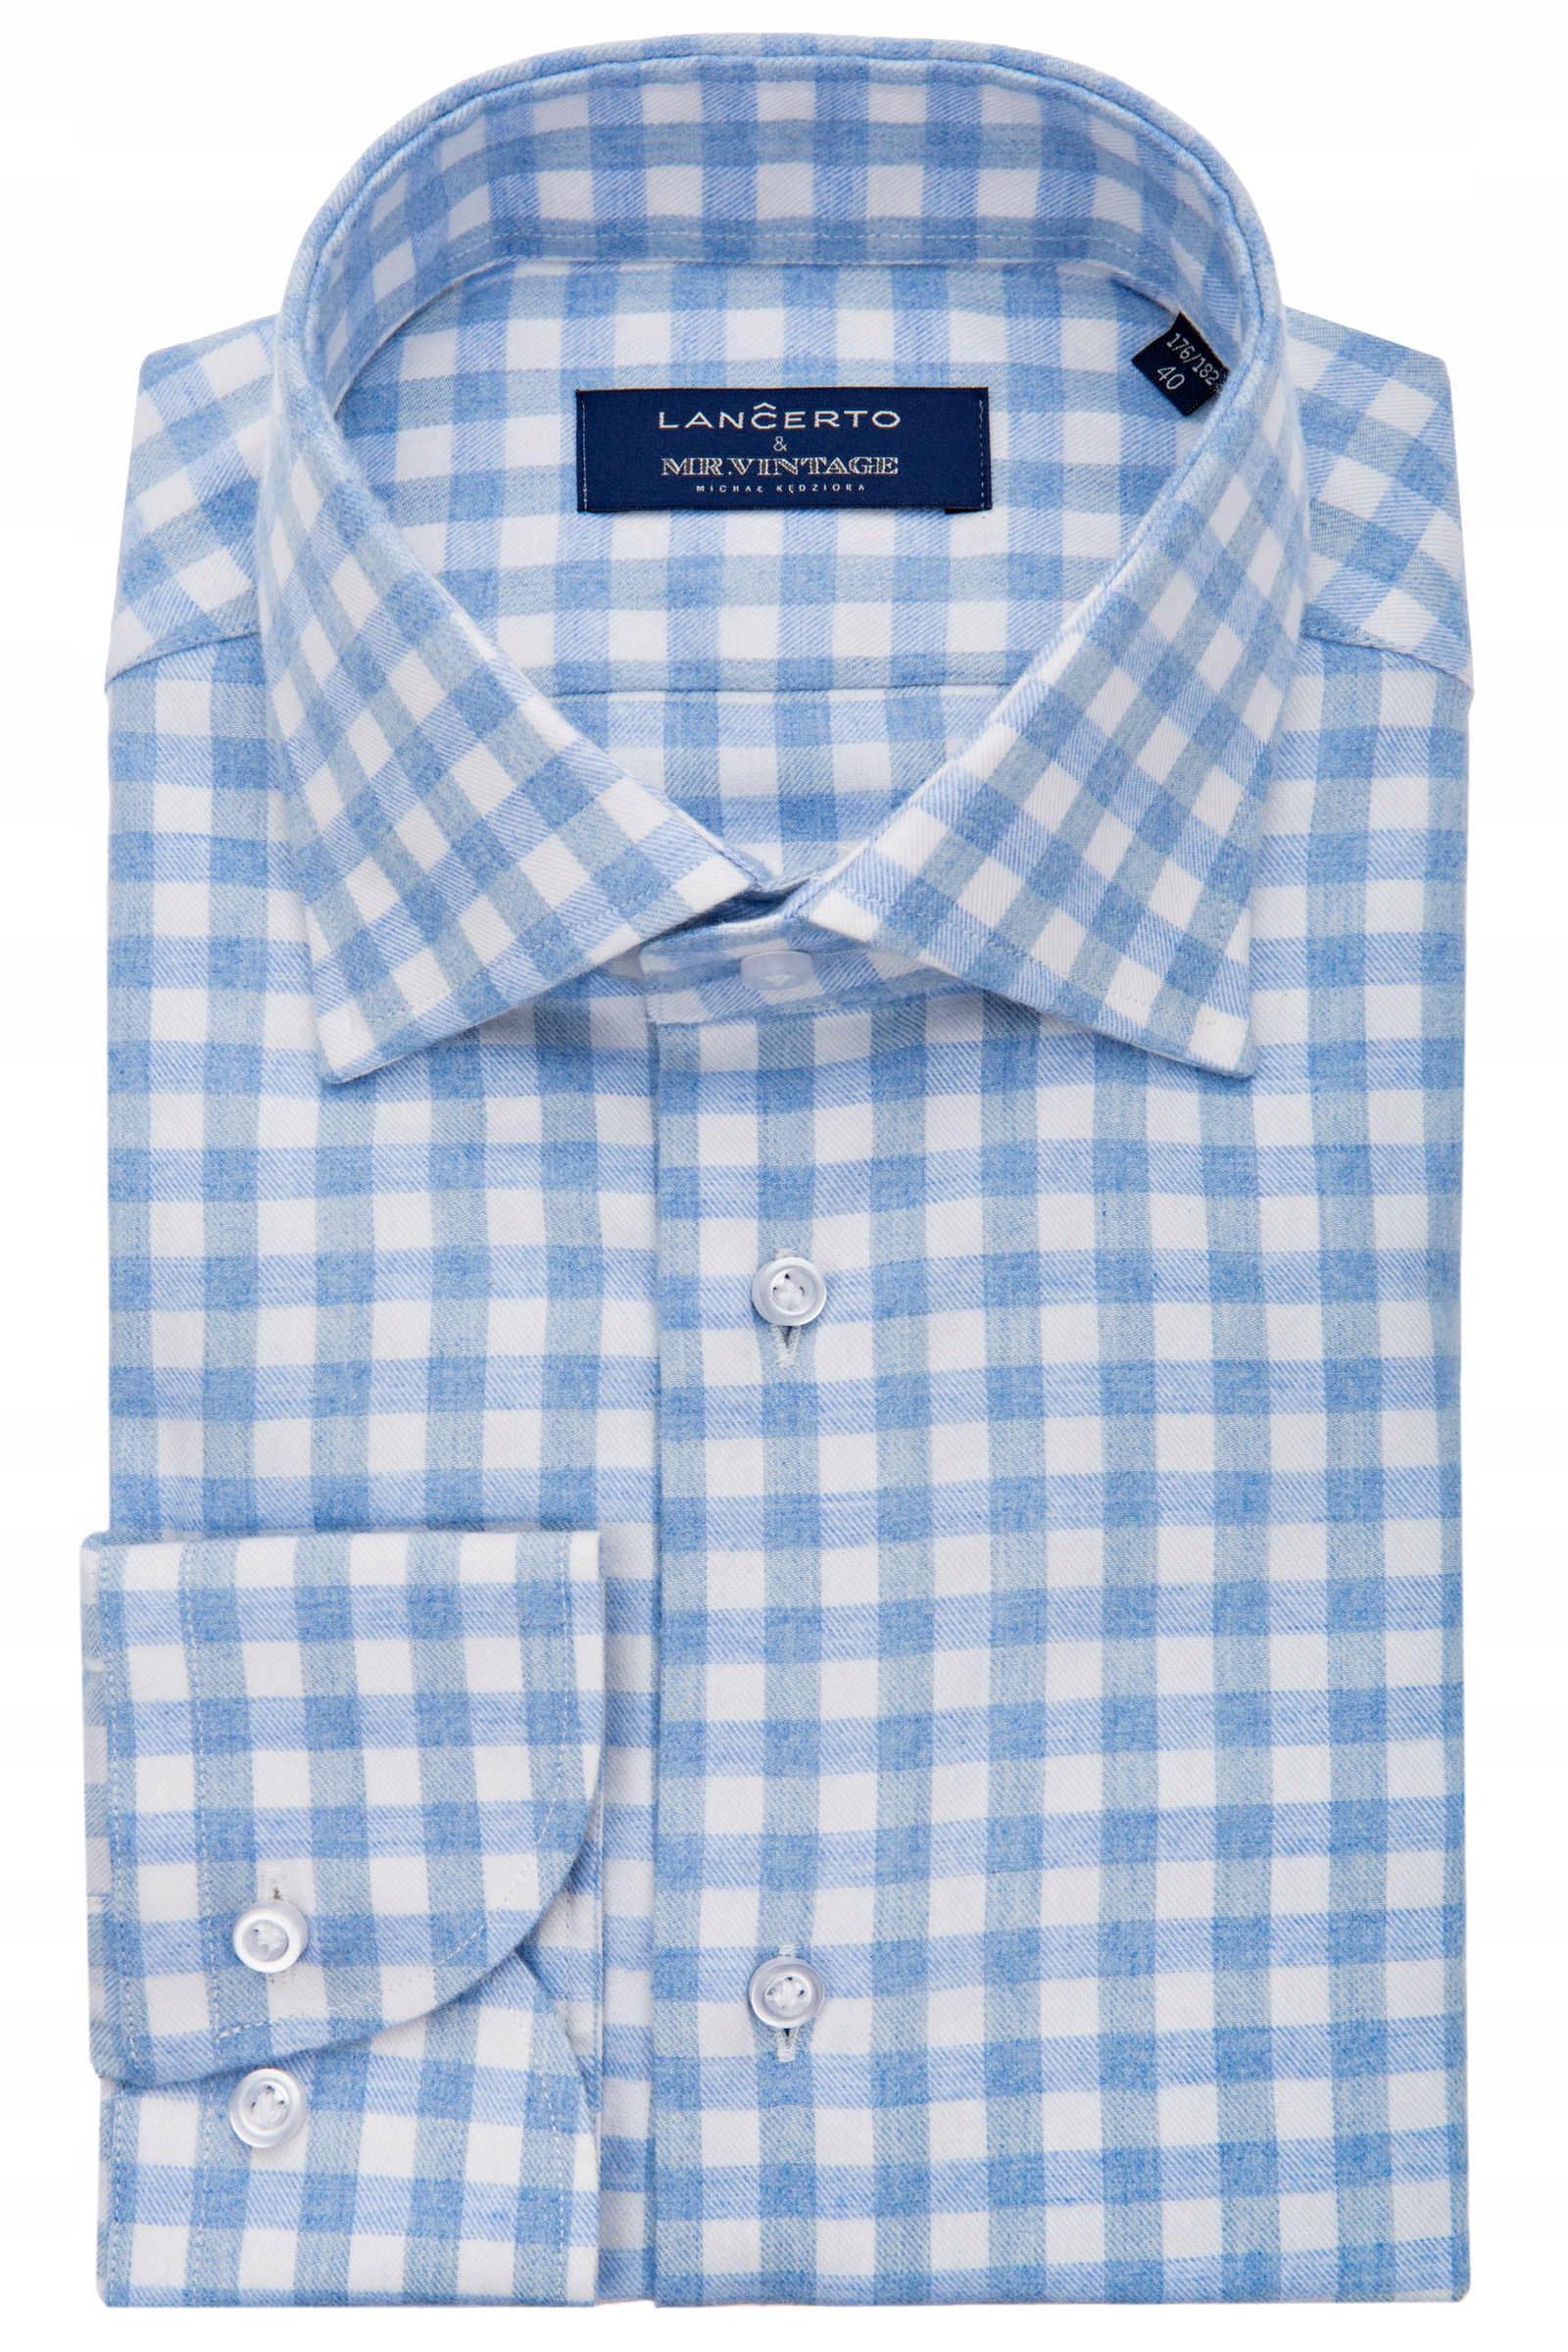 Lancerto tričko&Pán Vintage Clyde 176/41